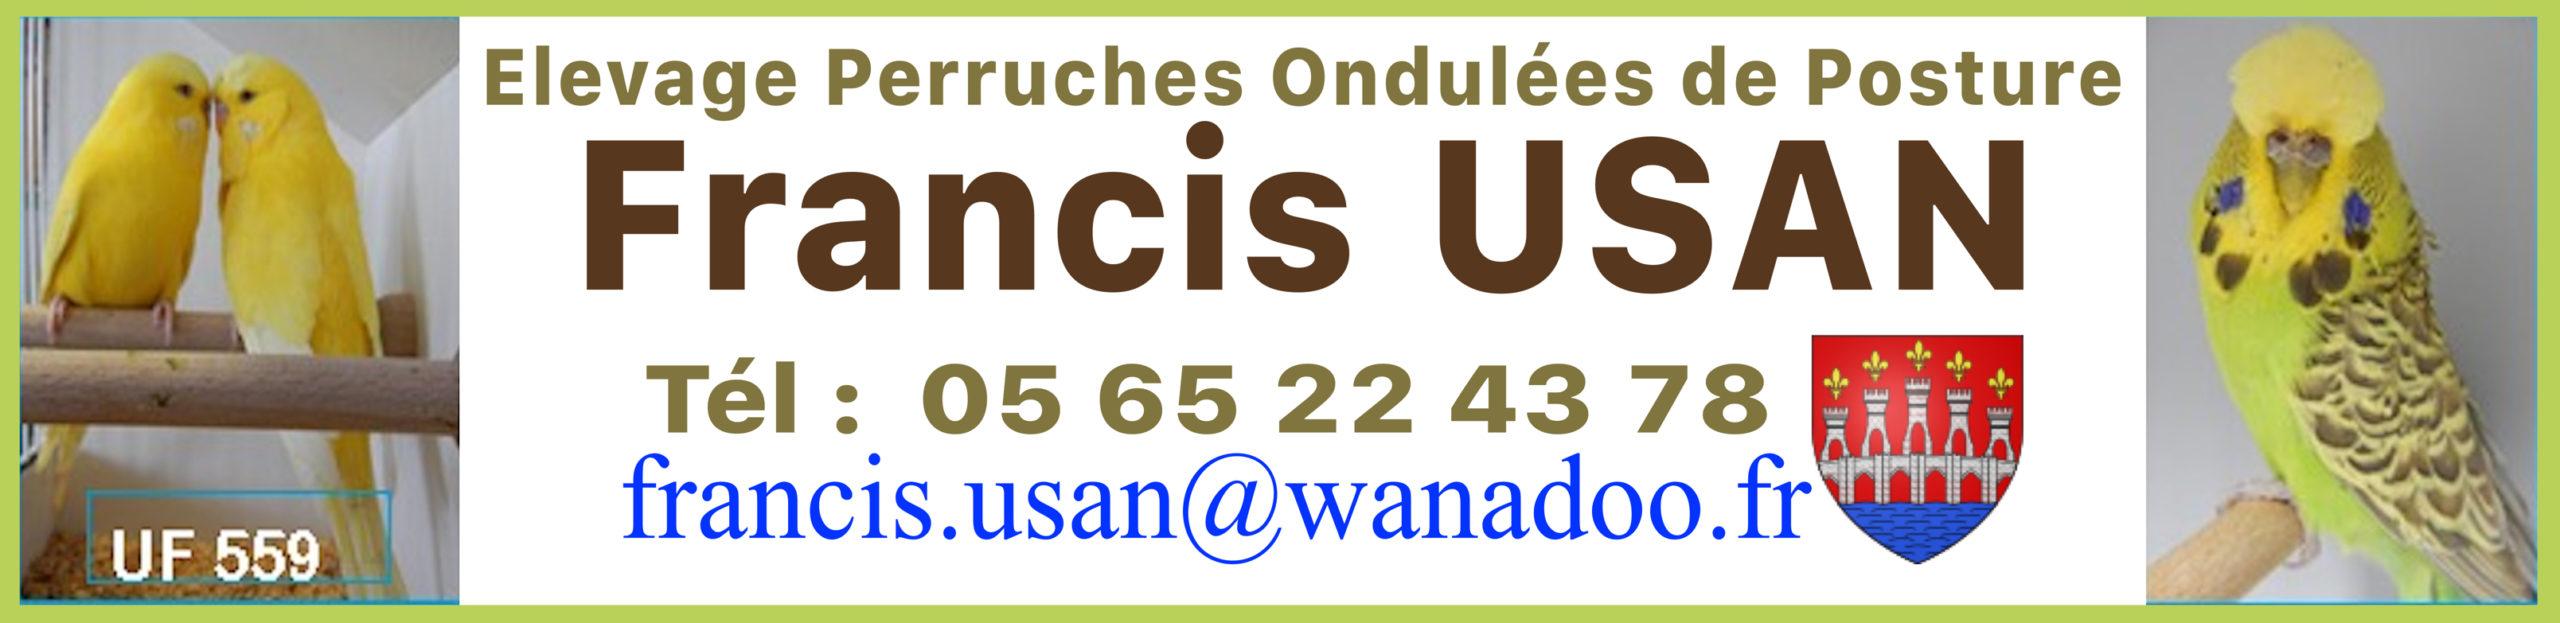 Francis USAN